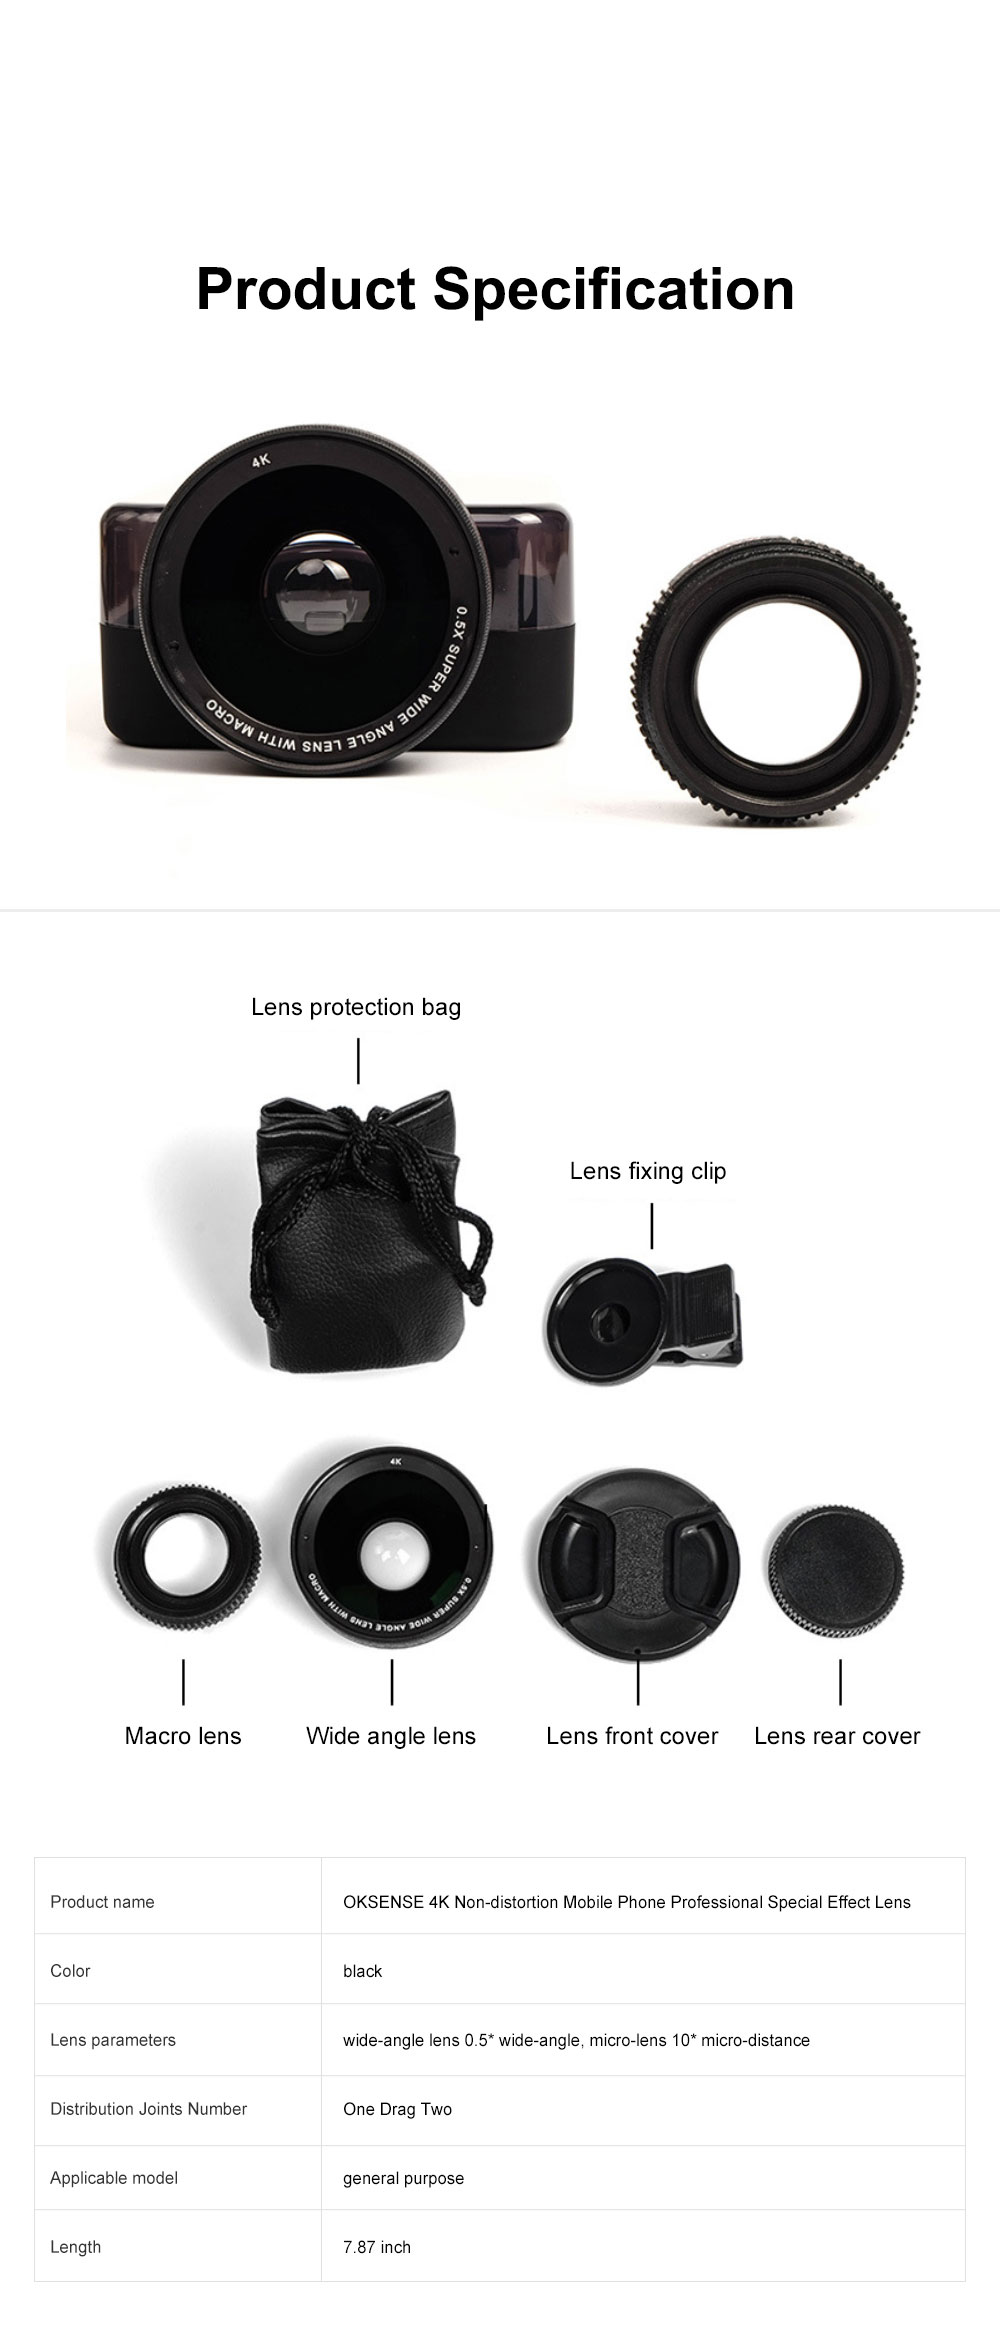 OKSENSE 4K Non-distortion Professional Mobile Phone Camera Lens Special Effect Lens Super Wide-angle Micro-range Camera Lens 6